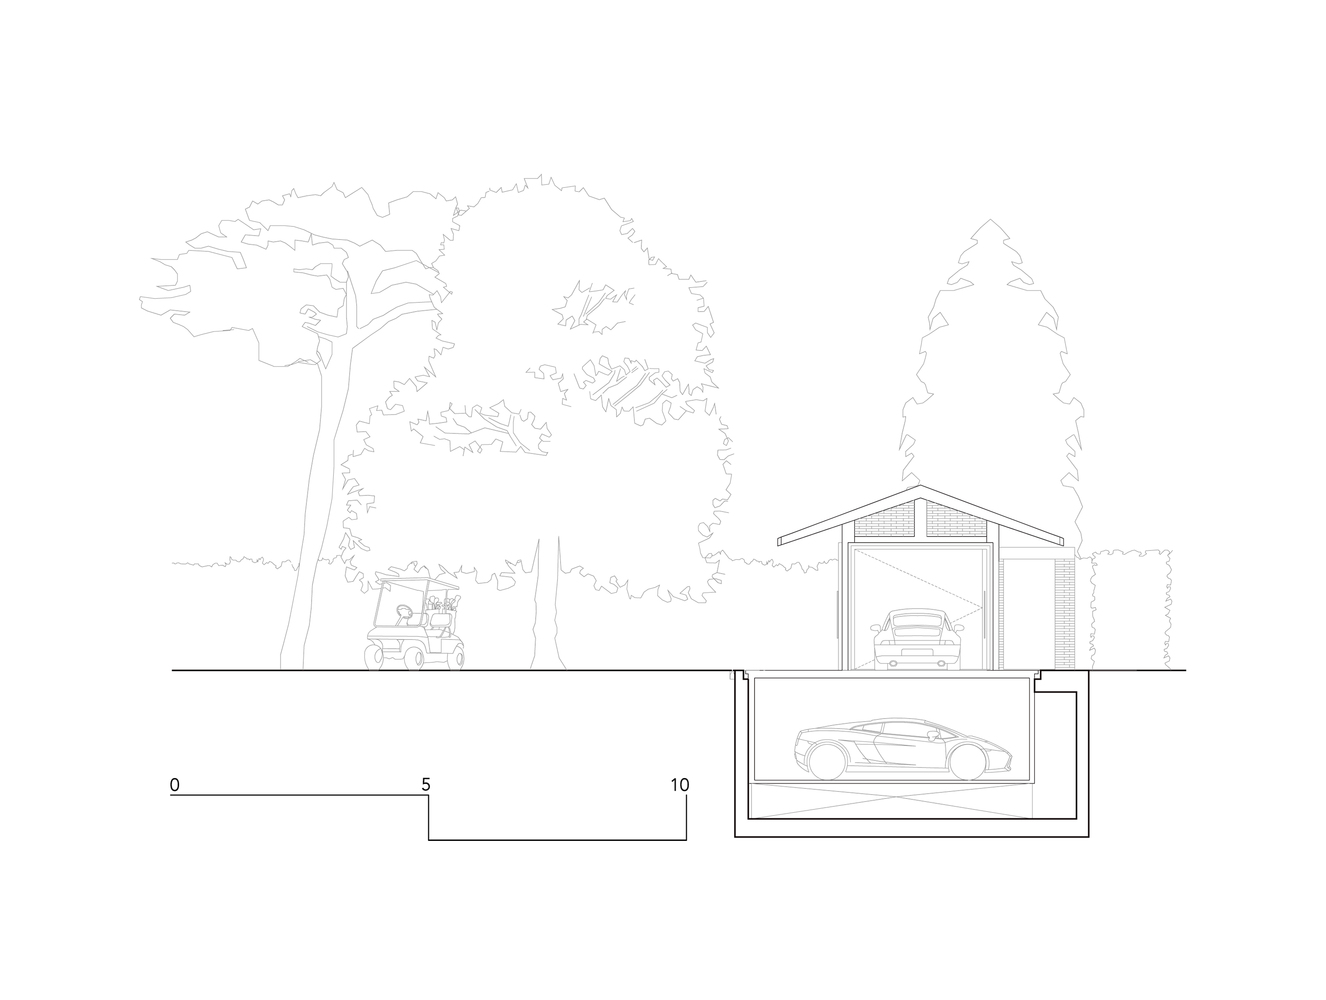 Планировка гаража с навесом